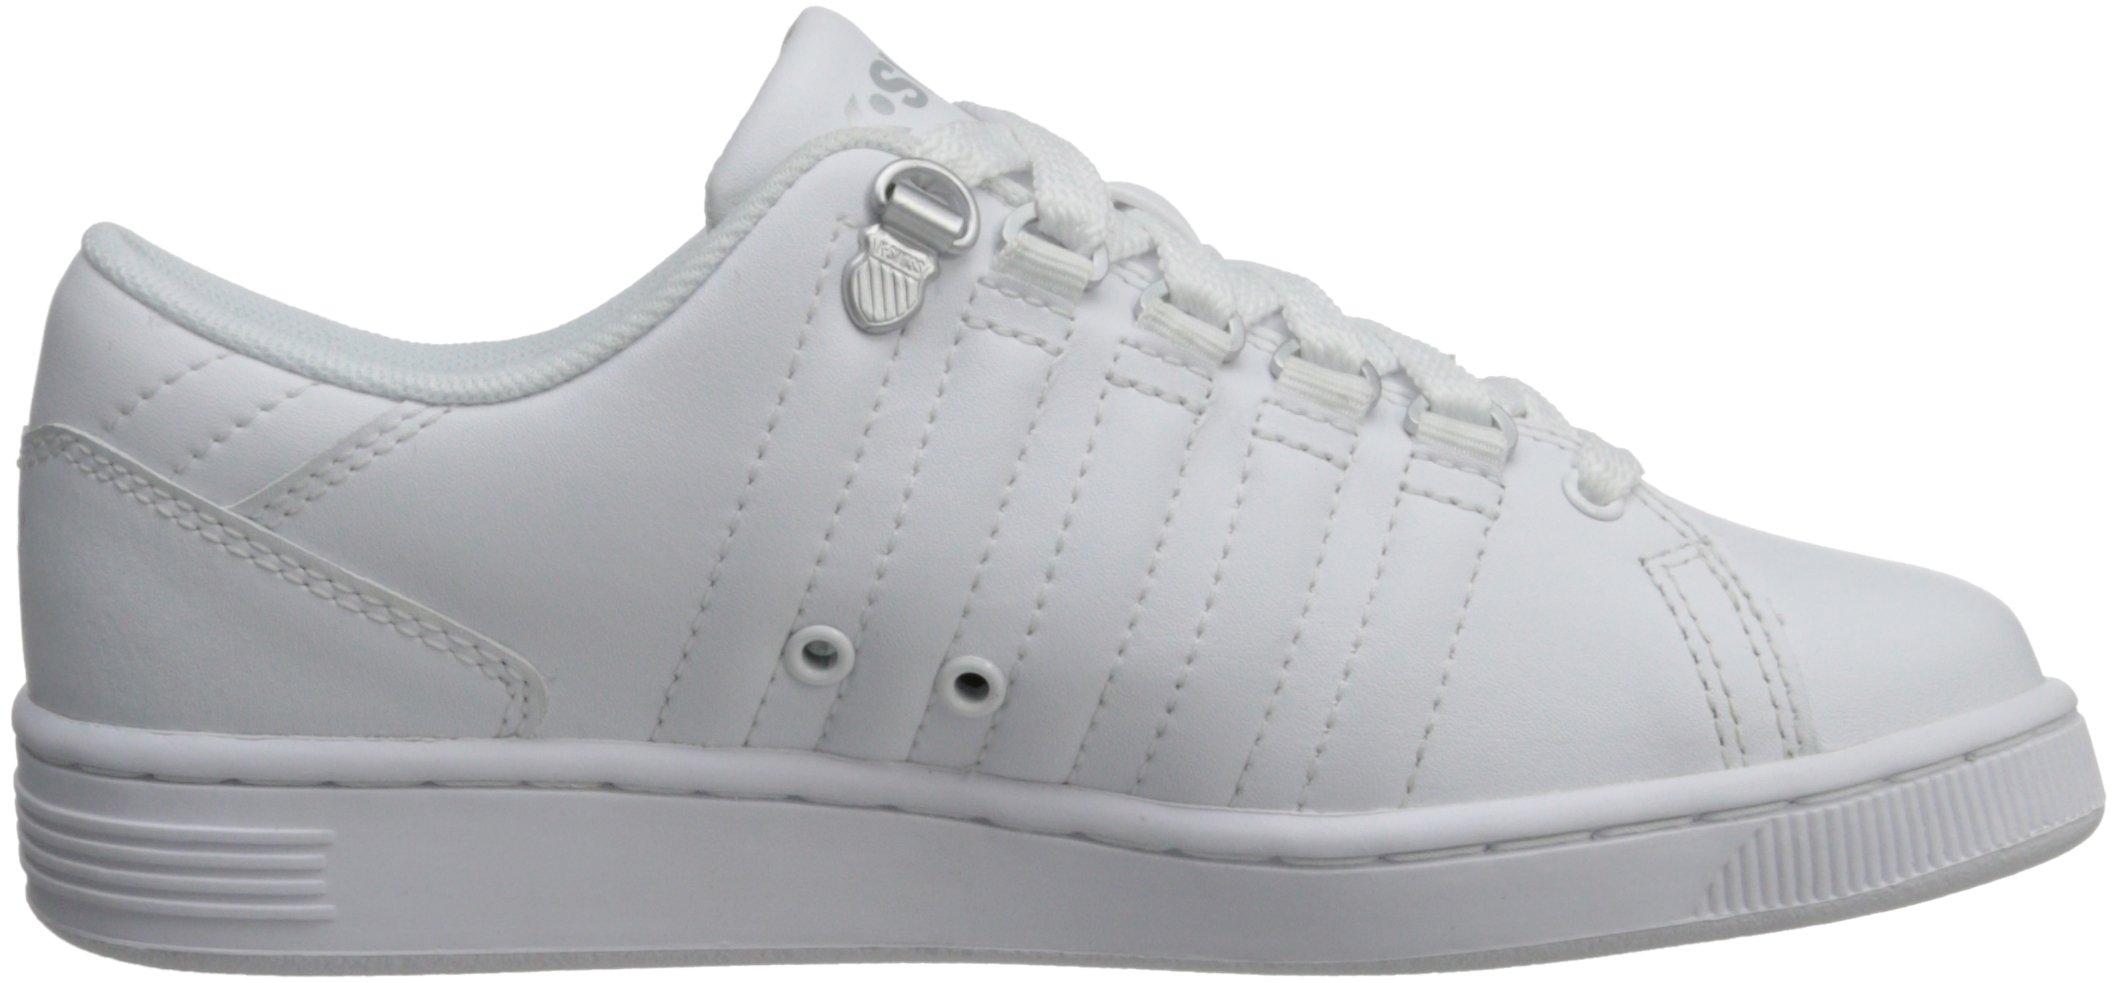 K-Swiss 8110 Lozan Sneaker (Big Kid),White/White/Silver,3.5 M US Big Kid by K-Swiss (Image #7)